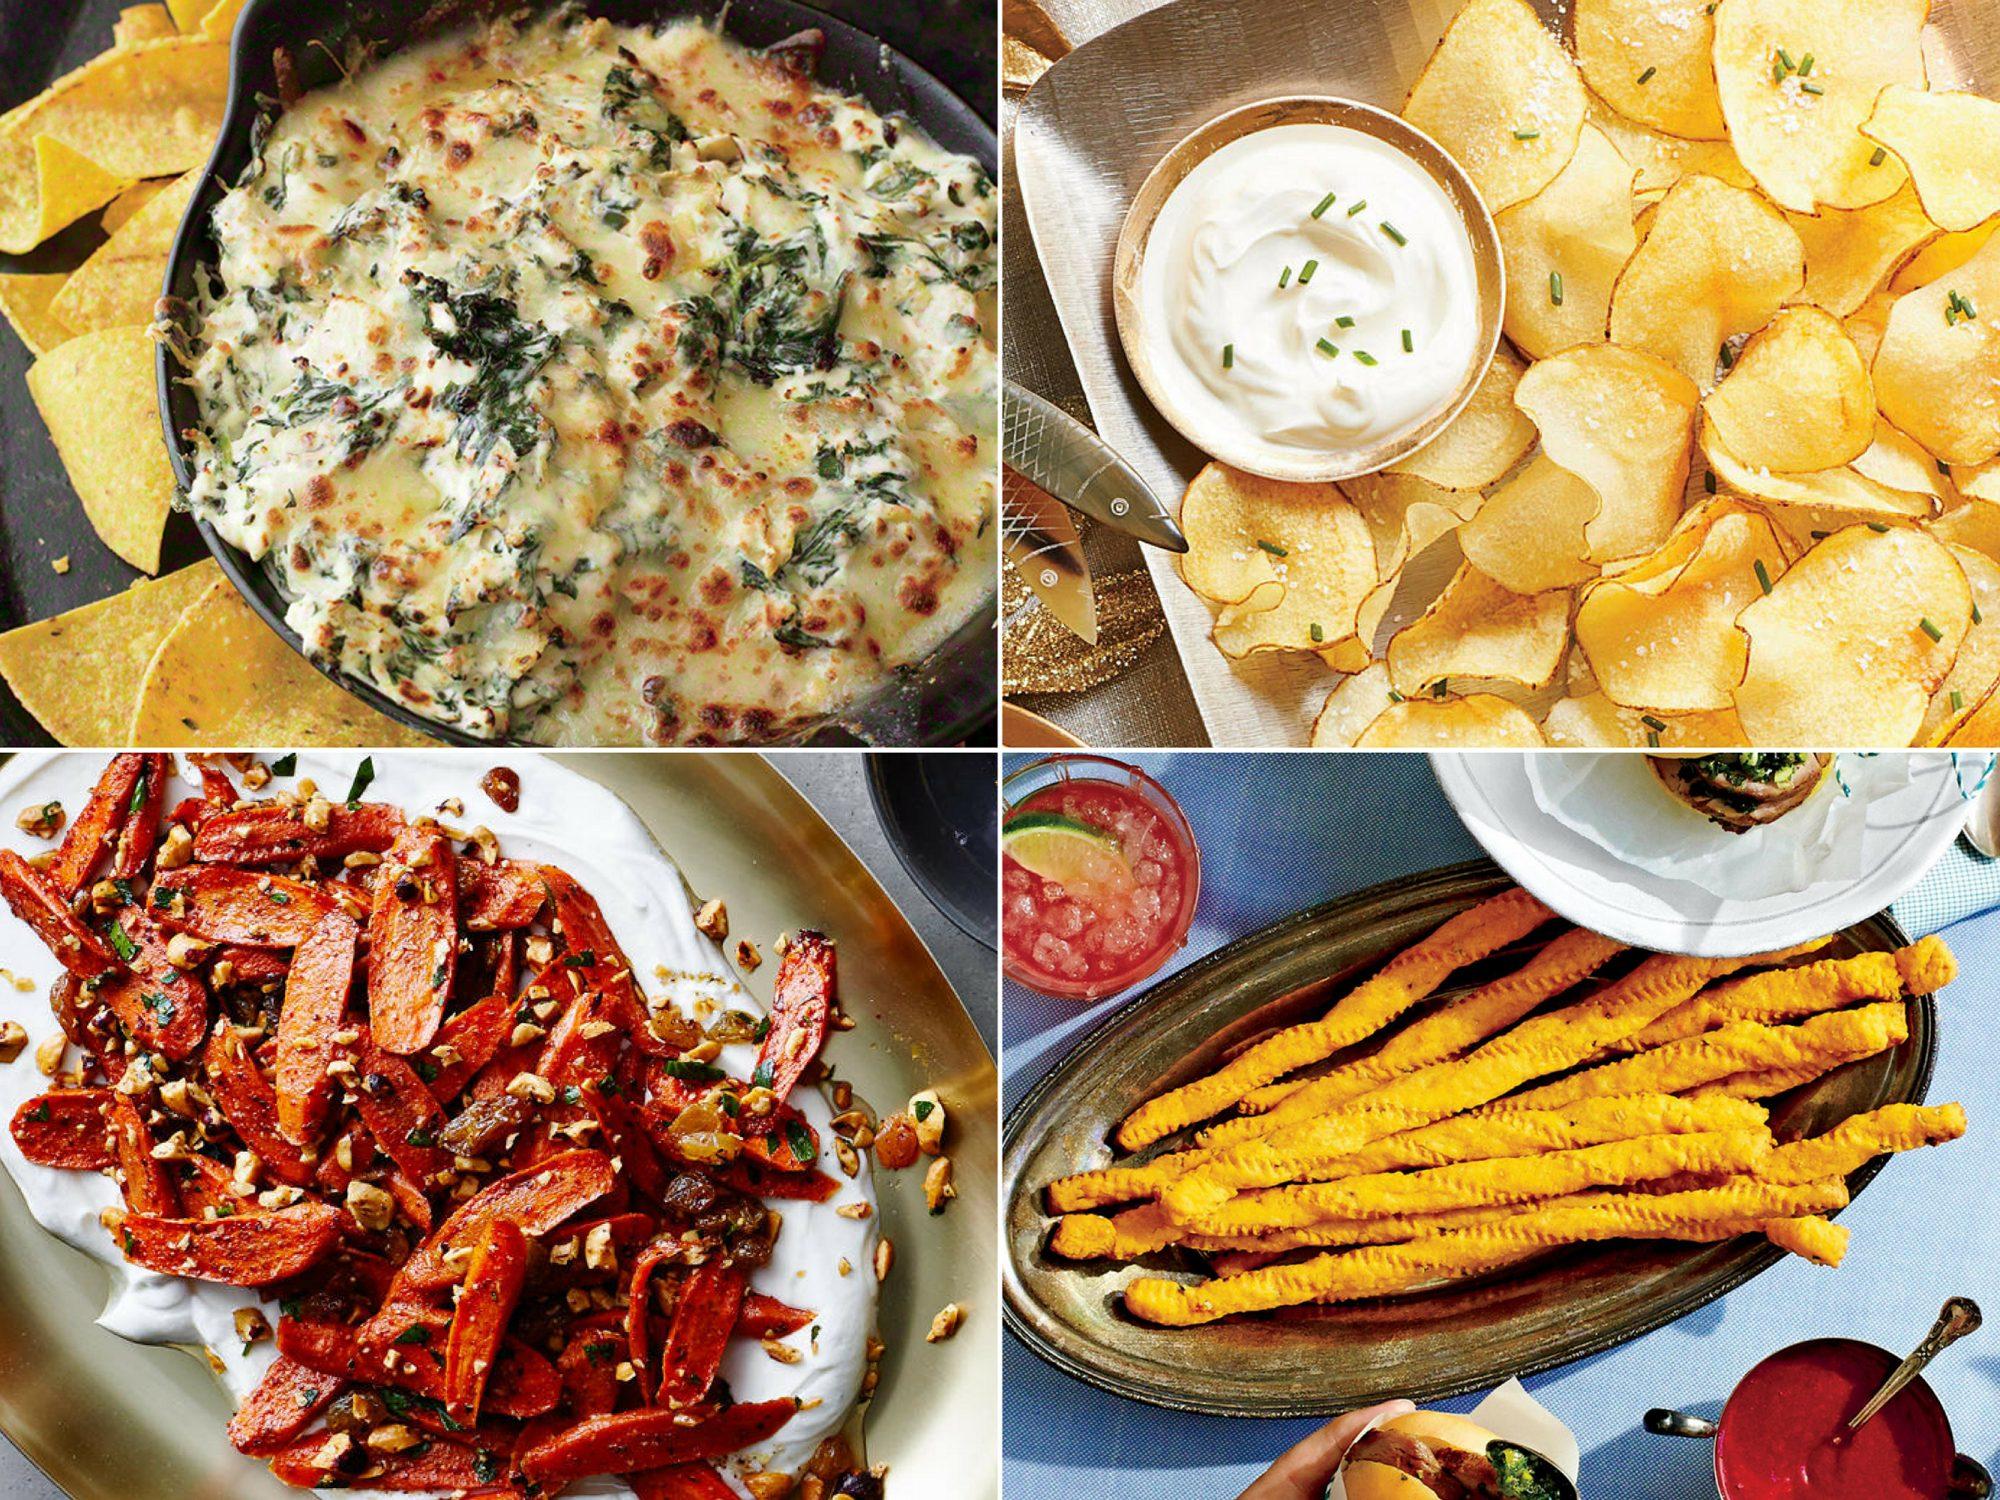 friendsgiving food ideas 30 appetizer side dish and dessert